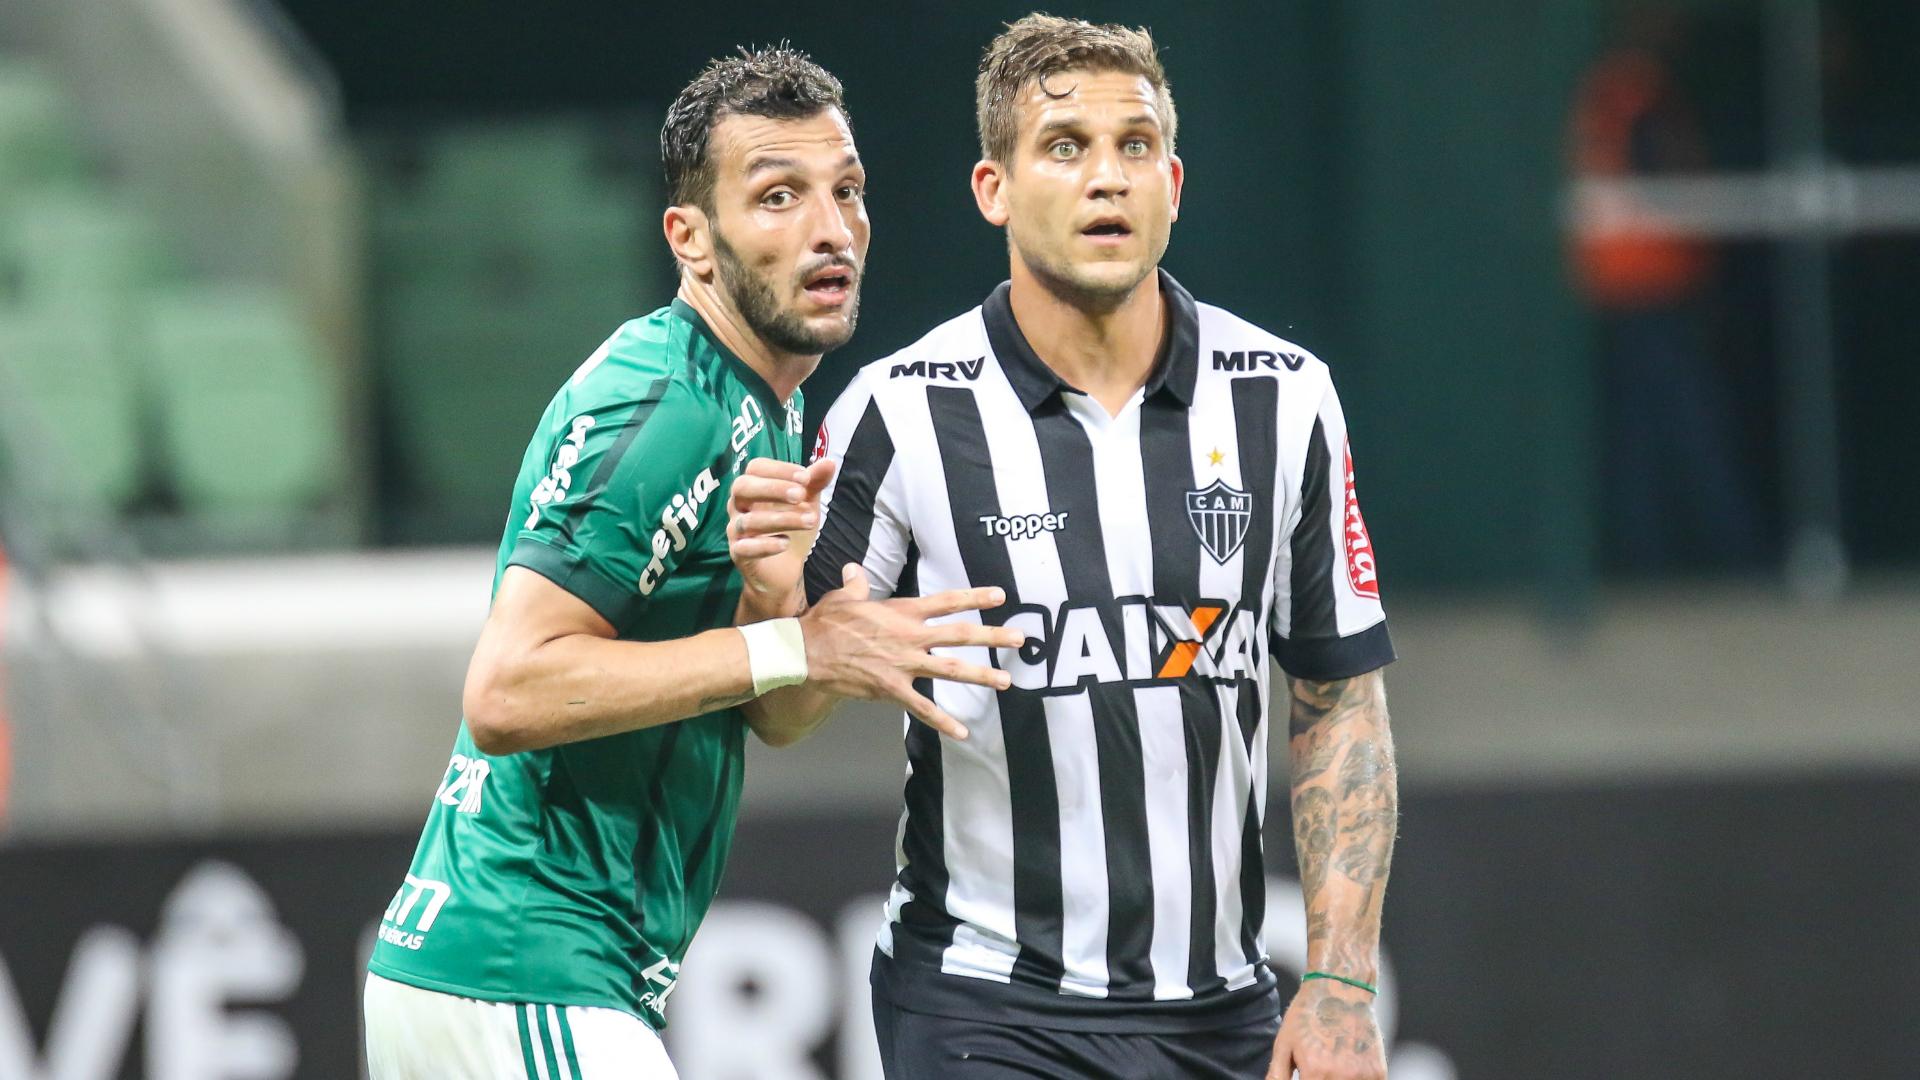 Edu Dracena Rafael Moura Palmeiras Atlético-MG Campeonato Brasileiro 04062017